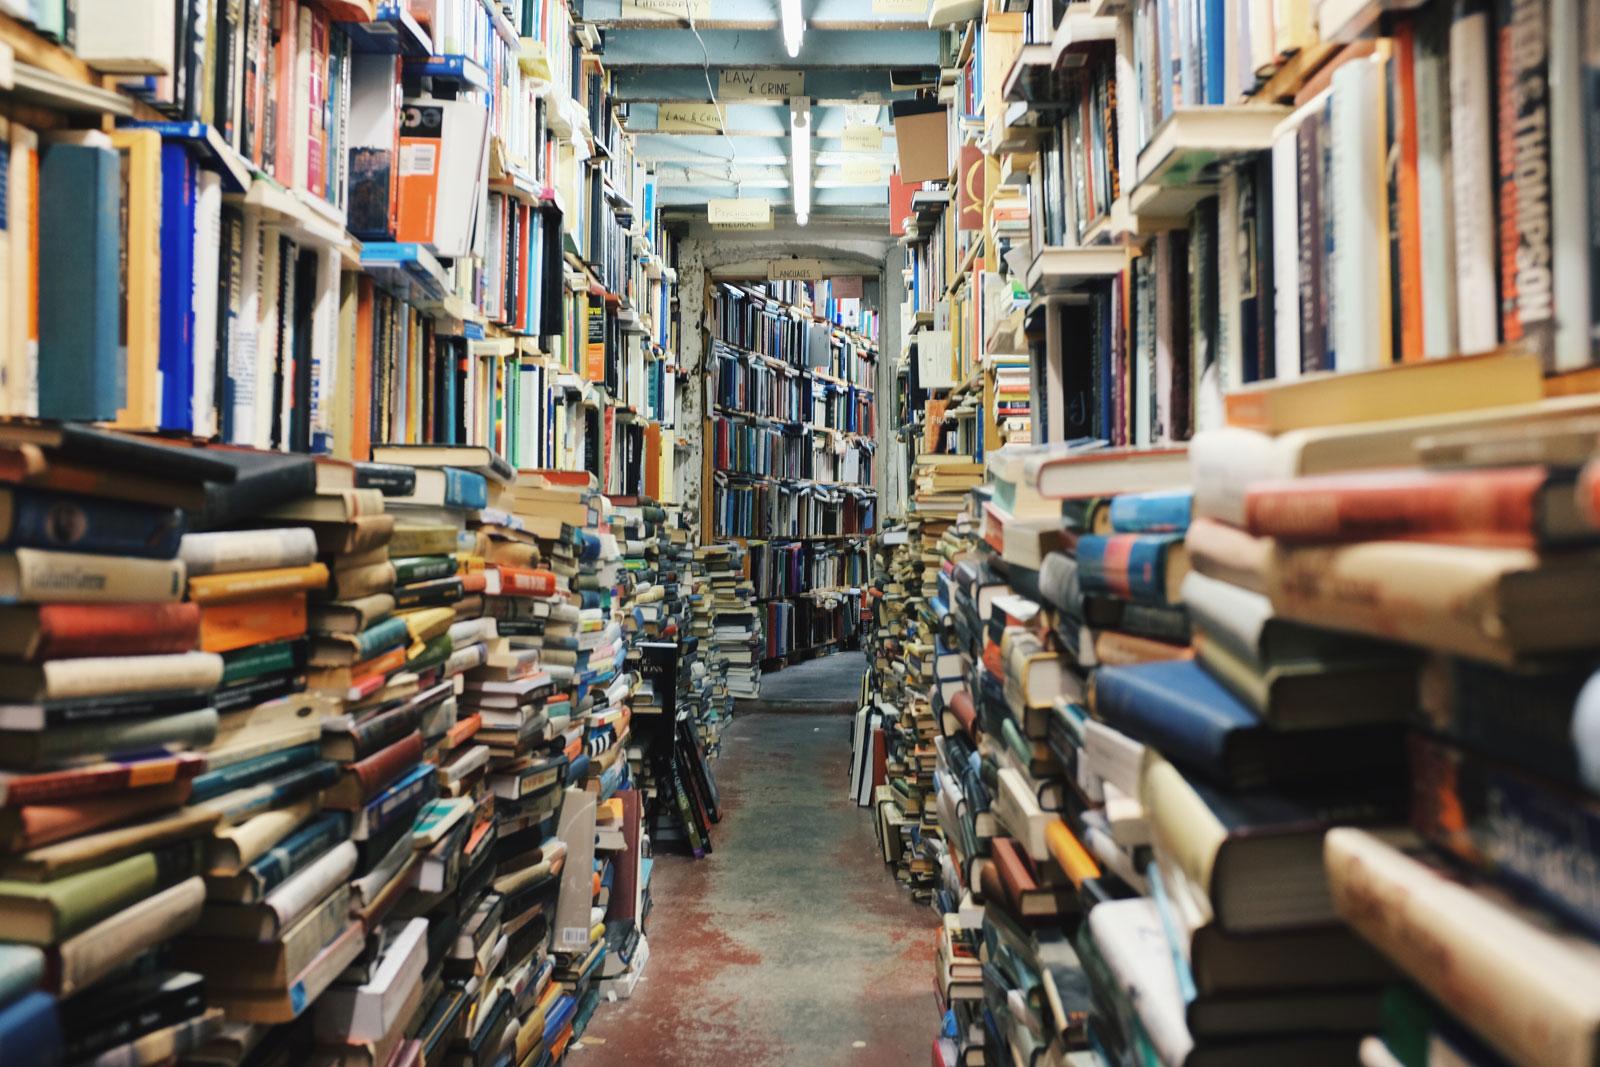 La biblioteca multimedia de WordPress